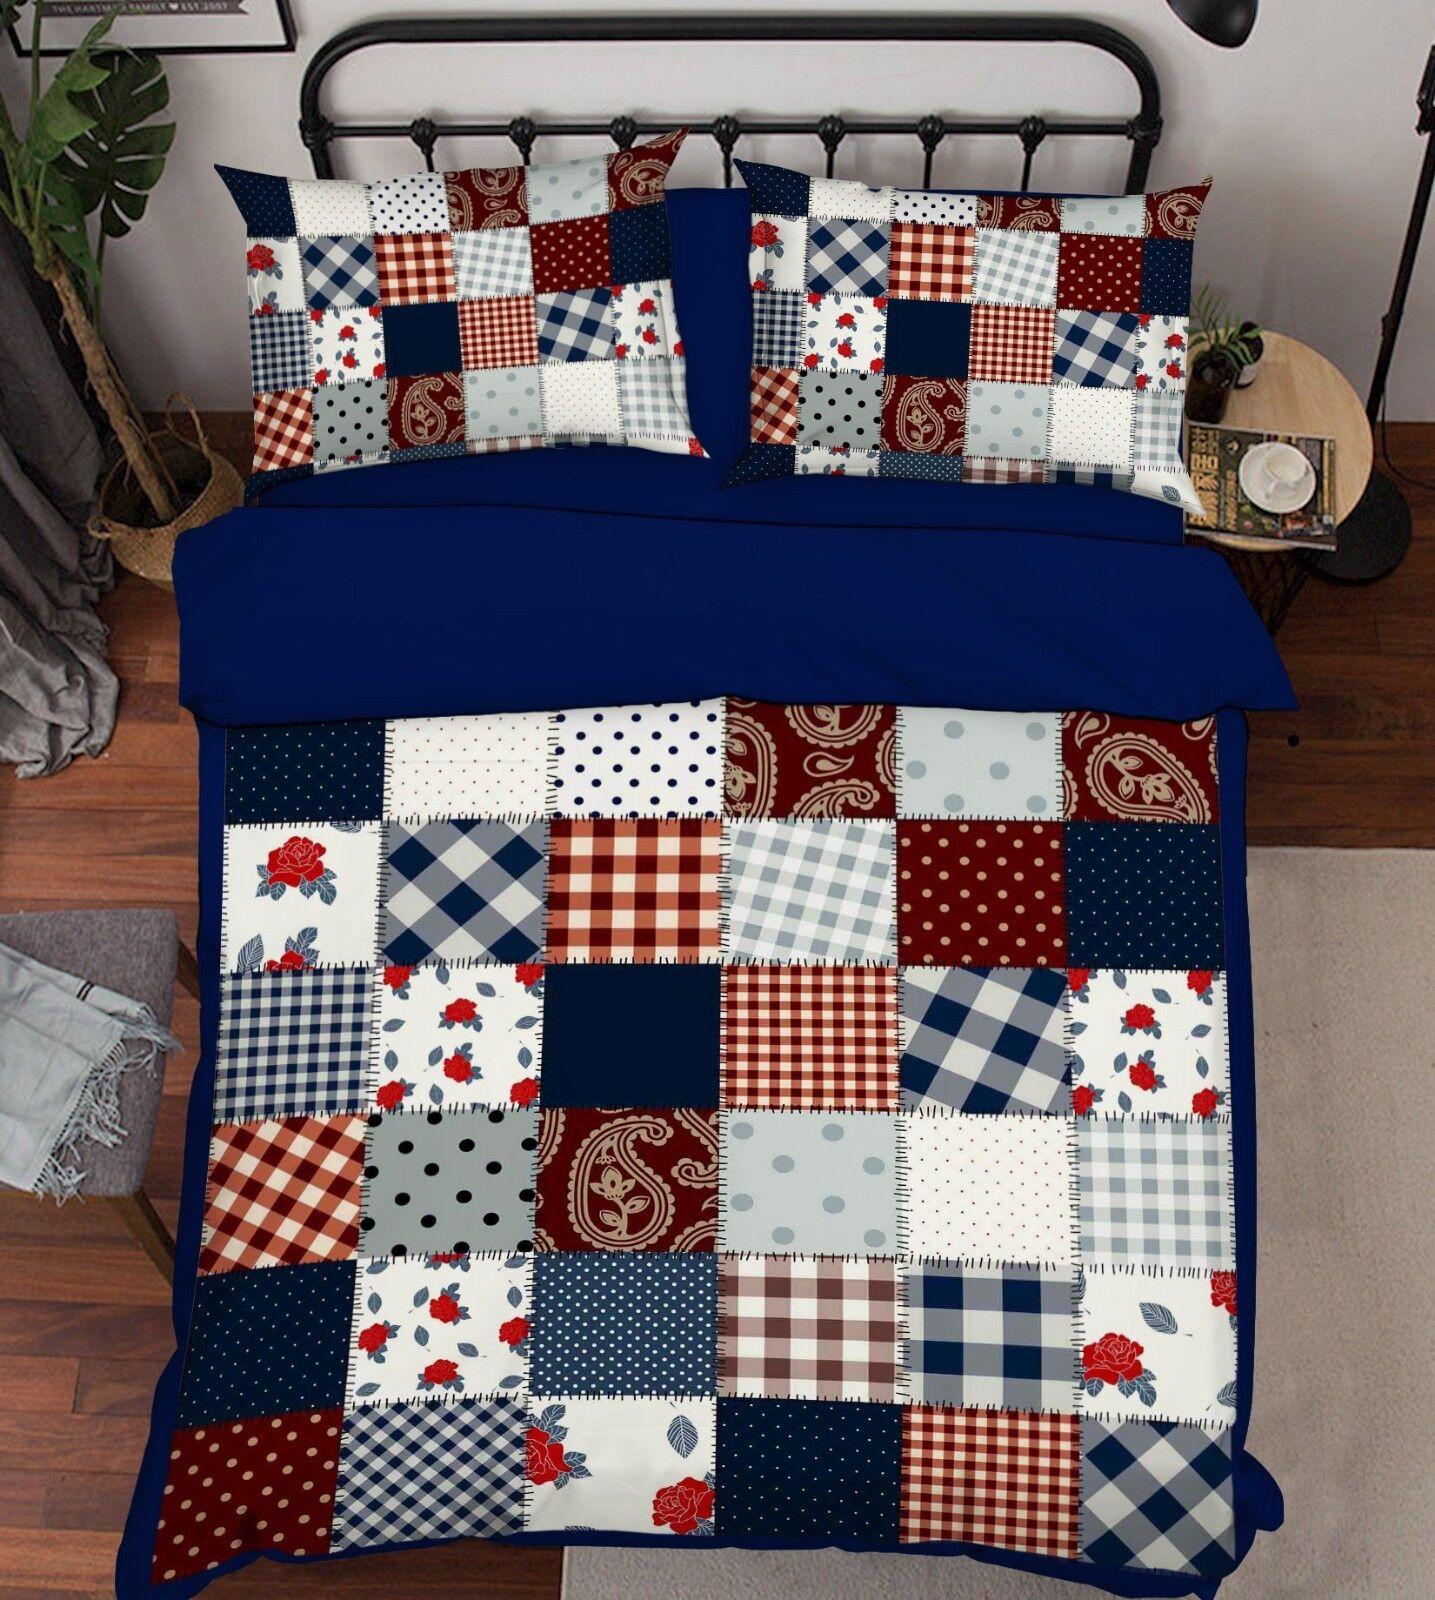 3D Painted Lattice 6 Bed Pillowcases Quilt Duvet Cover Set Single Queen AU Carly